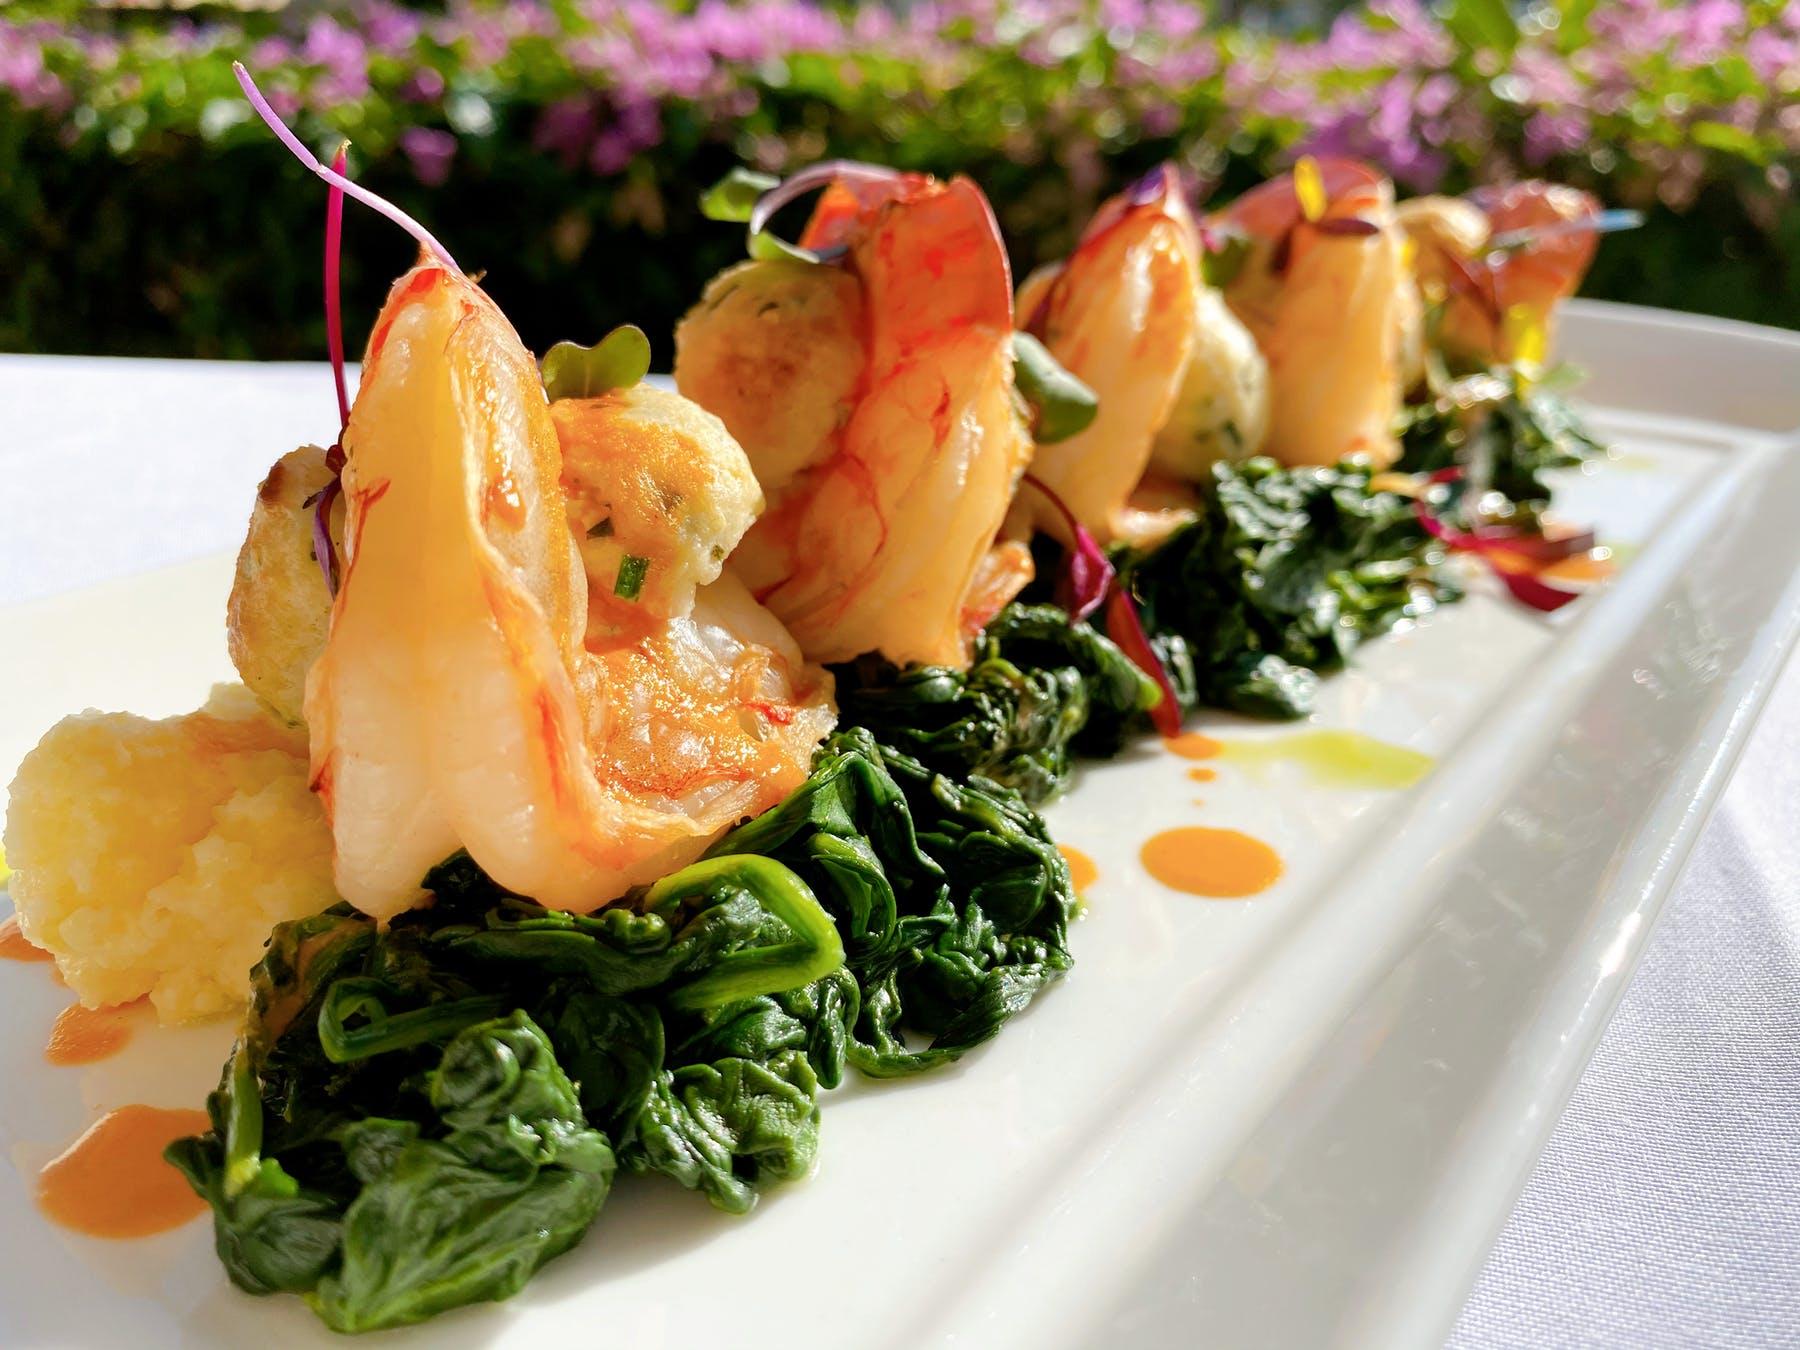 Boursin Stuffed Pink Gulf Shrimp